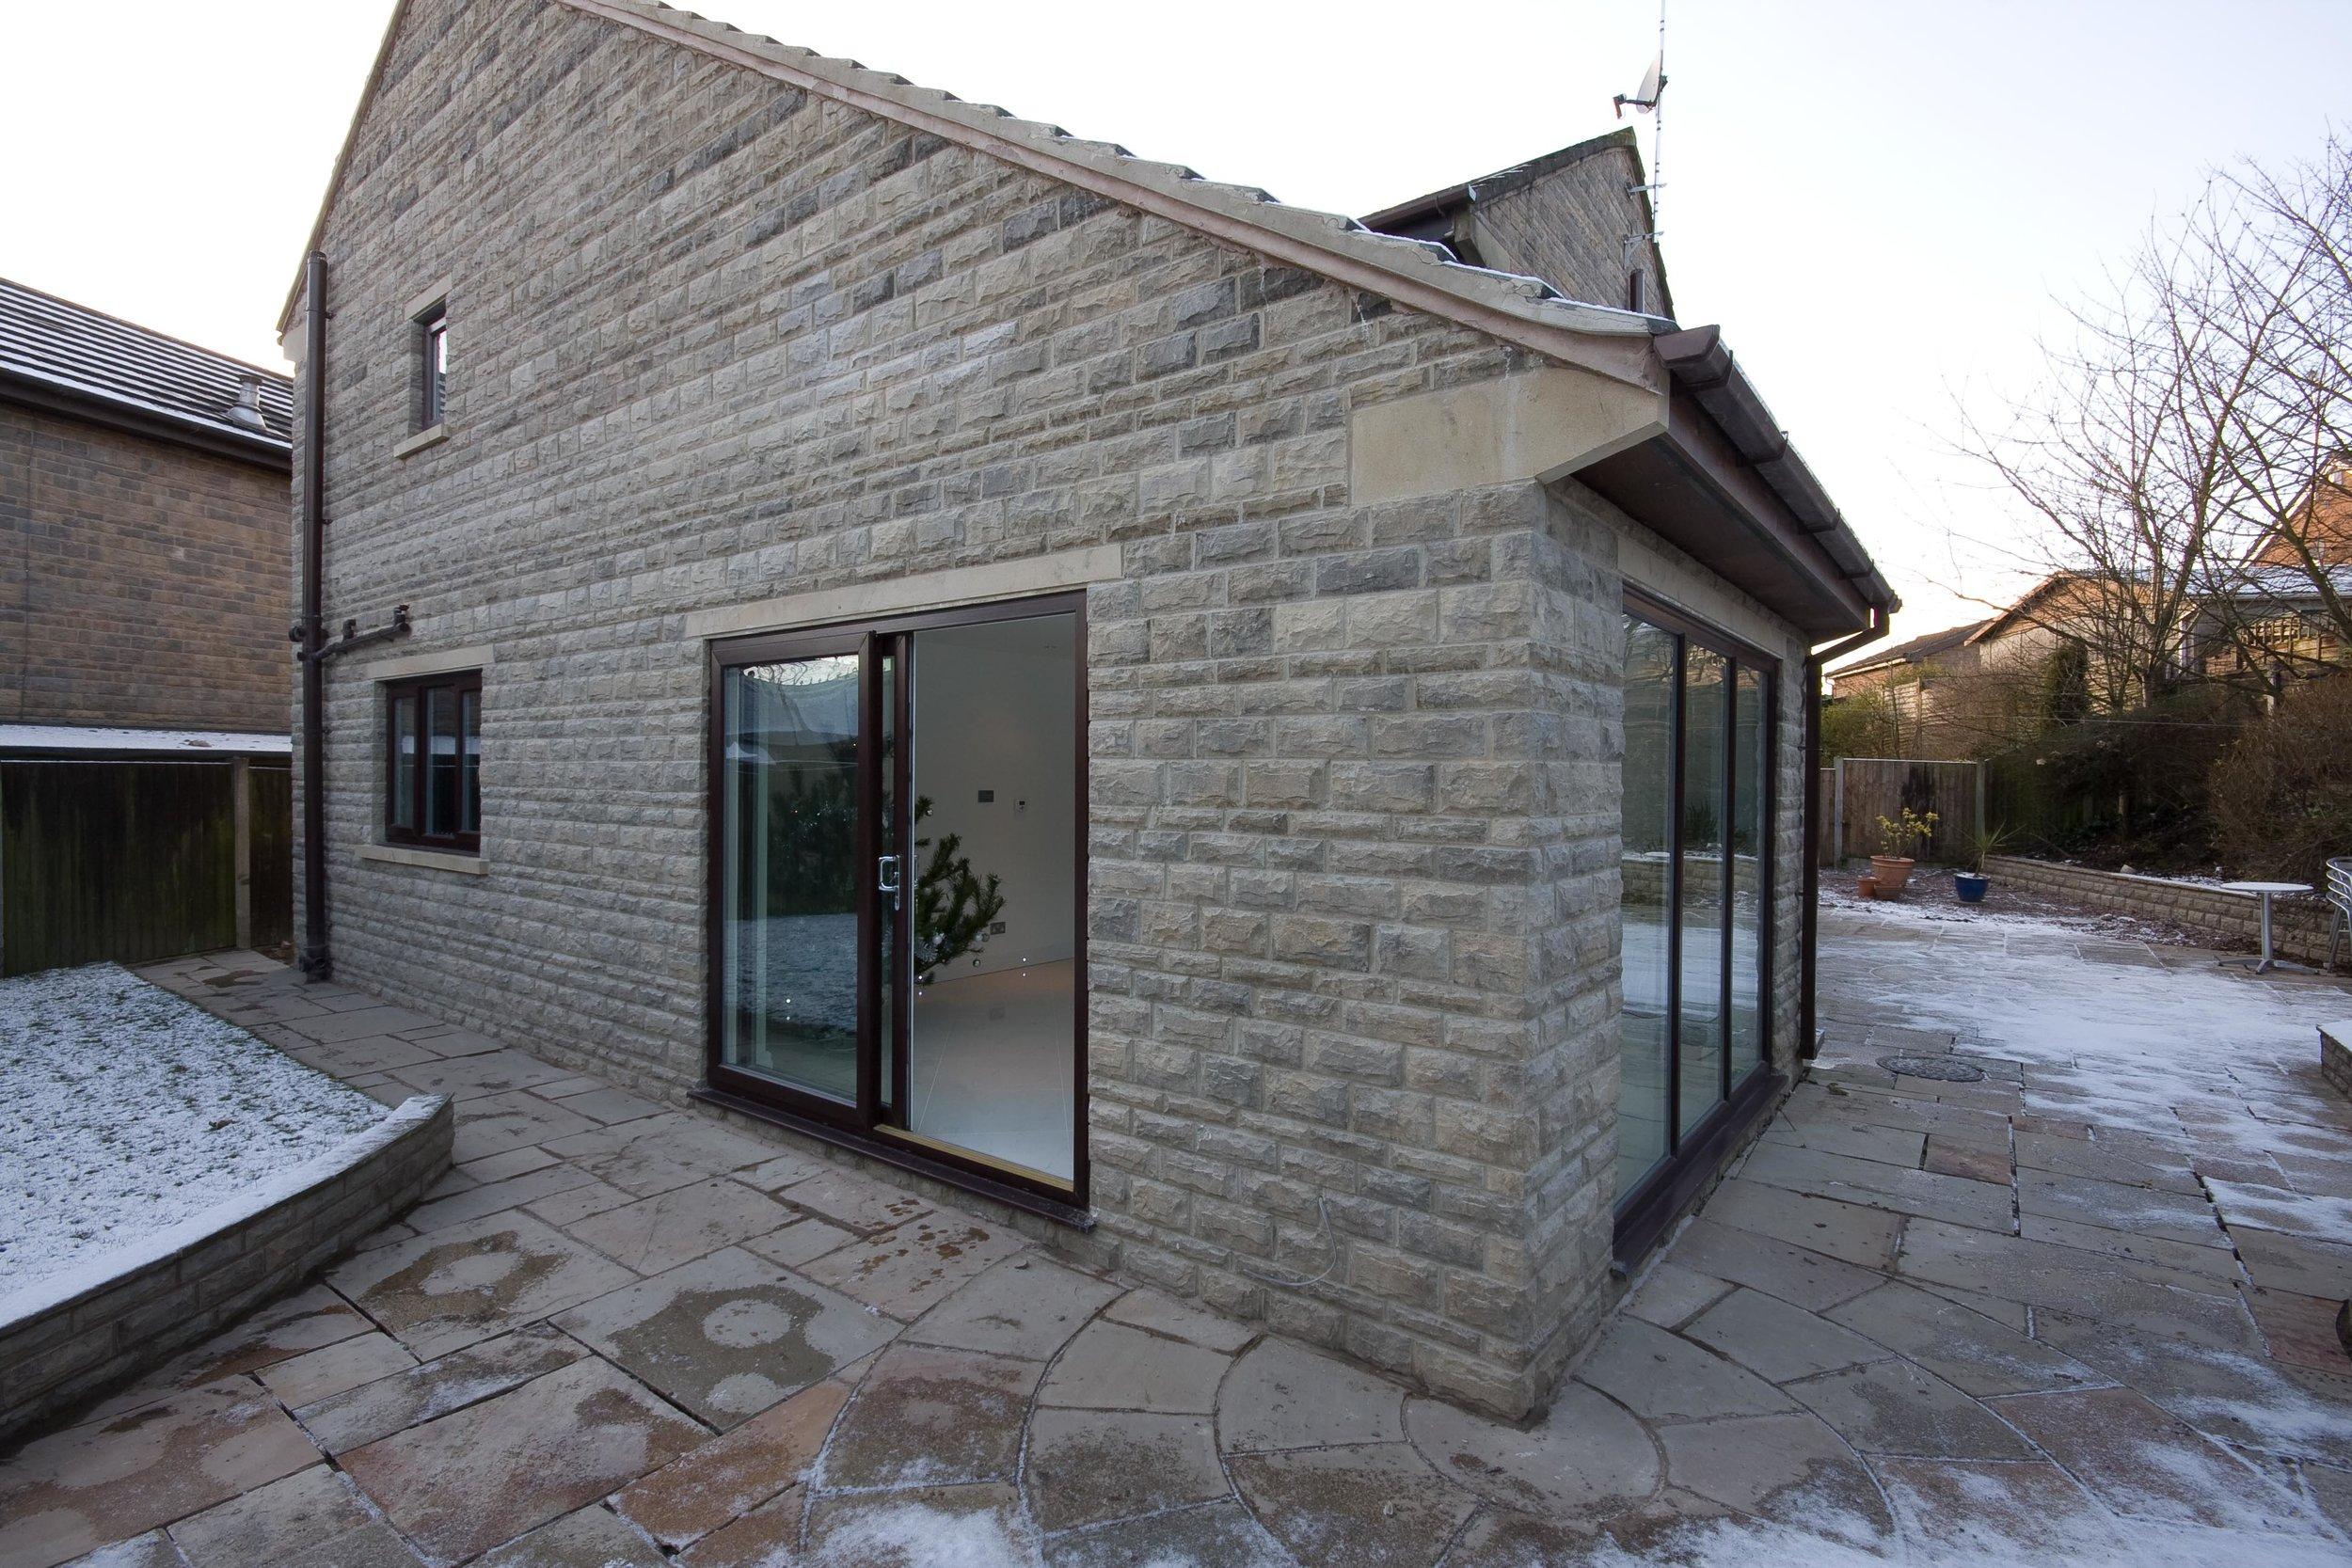 PropertyPhotographs-4532.jpg